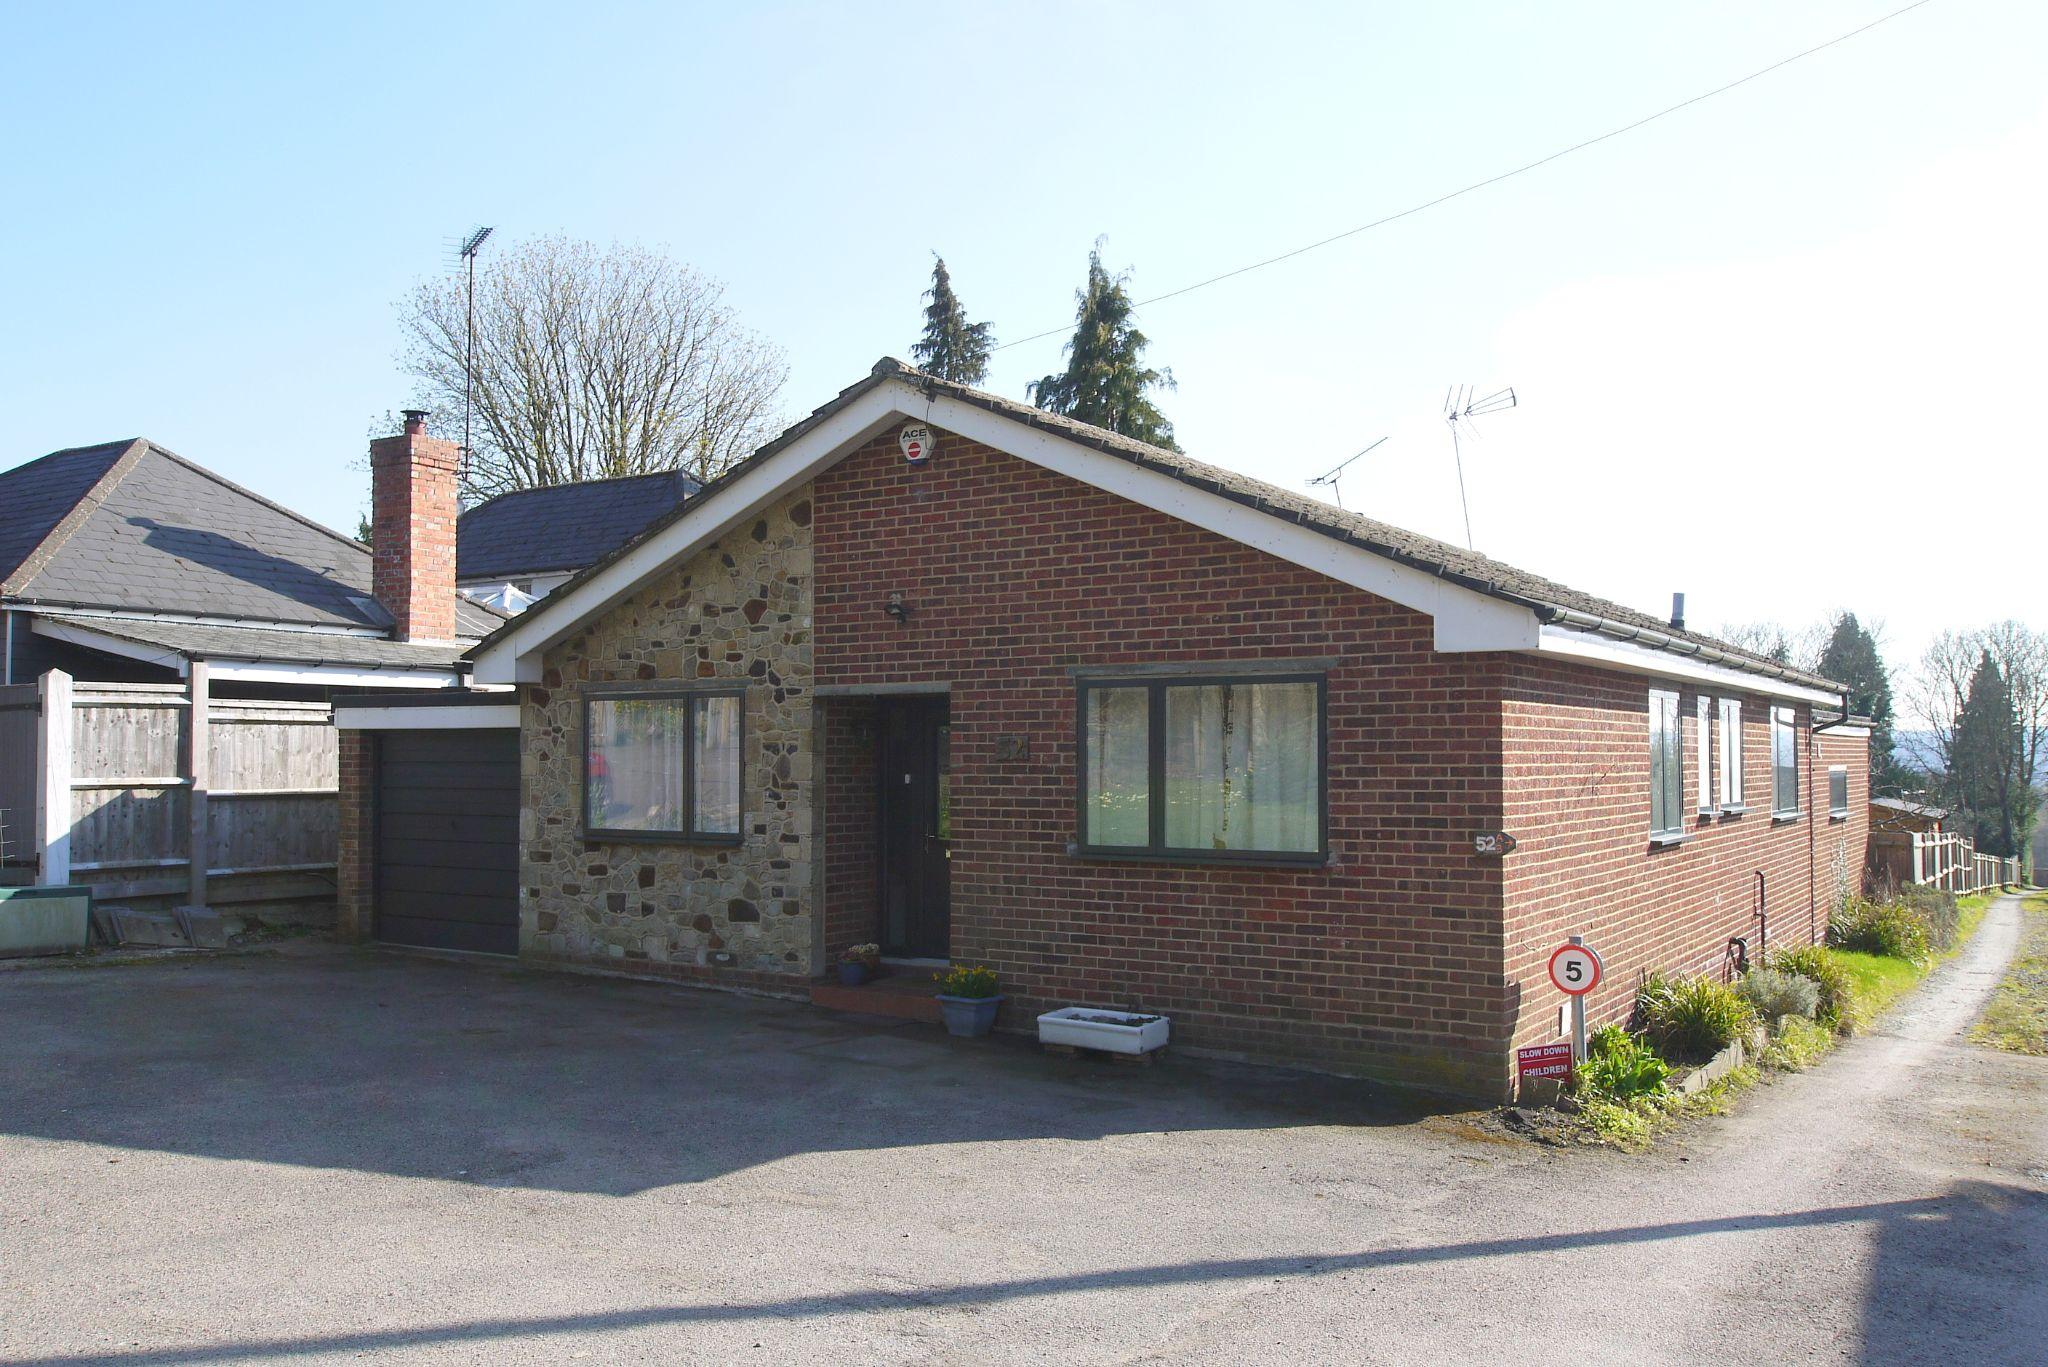 4 bedroom detached bungalow For Sale in Sevenoaks - Photograph 1